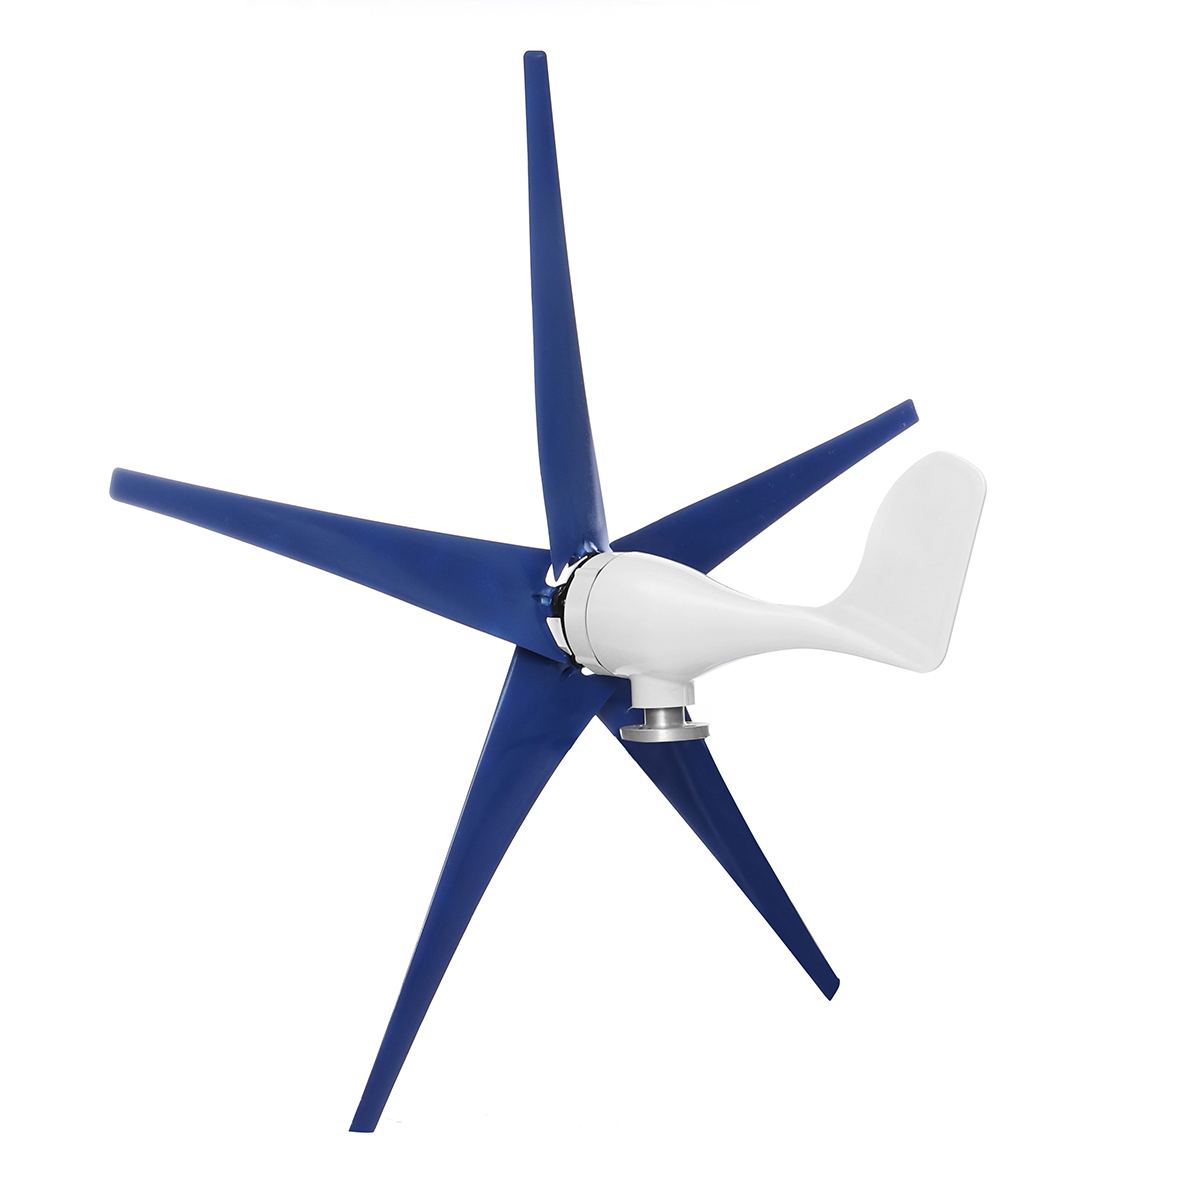 620W 3/5 Blades Wind Turbine Generator Kit with Wind Charge Controller Wind Generator Power Generator Three-phase AC Permanent Magnet Generator